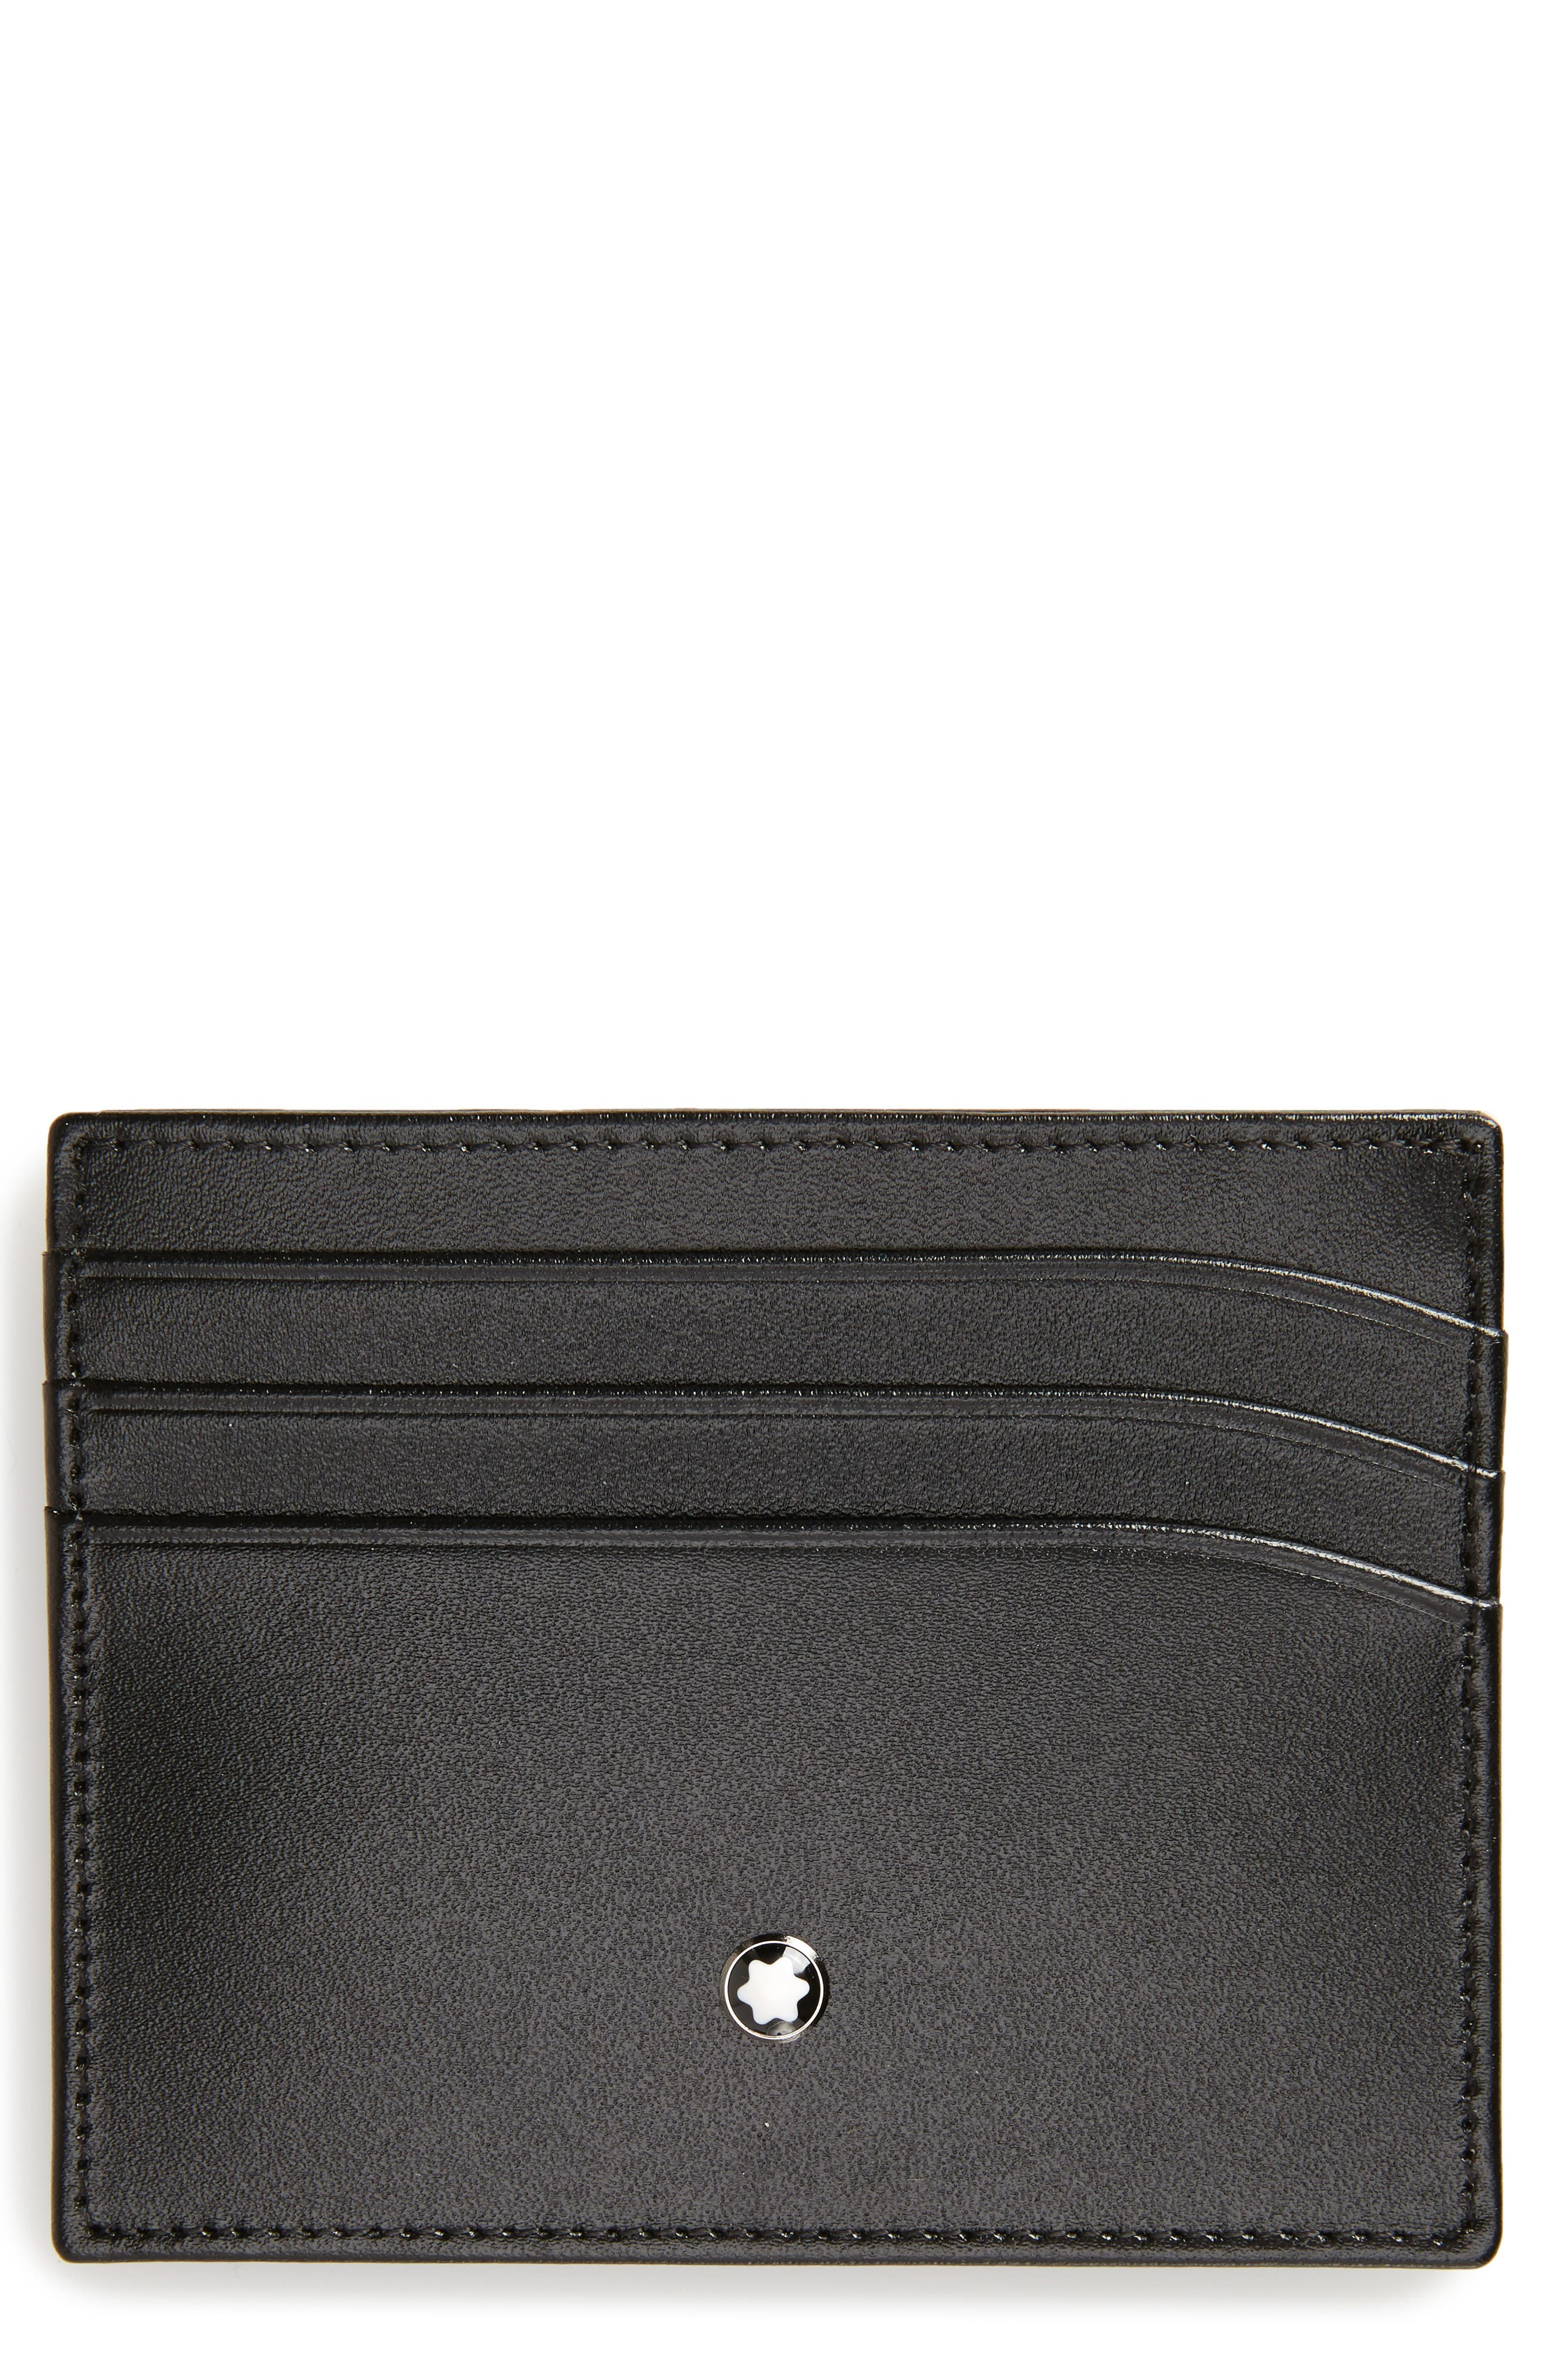 Meisterstück Leather Card Case,                             Main thumbnail 1, color,                             BLACK